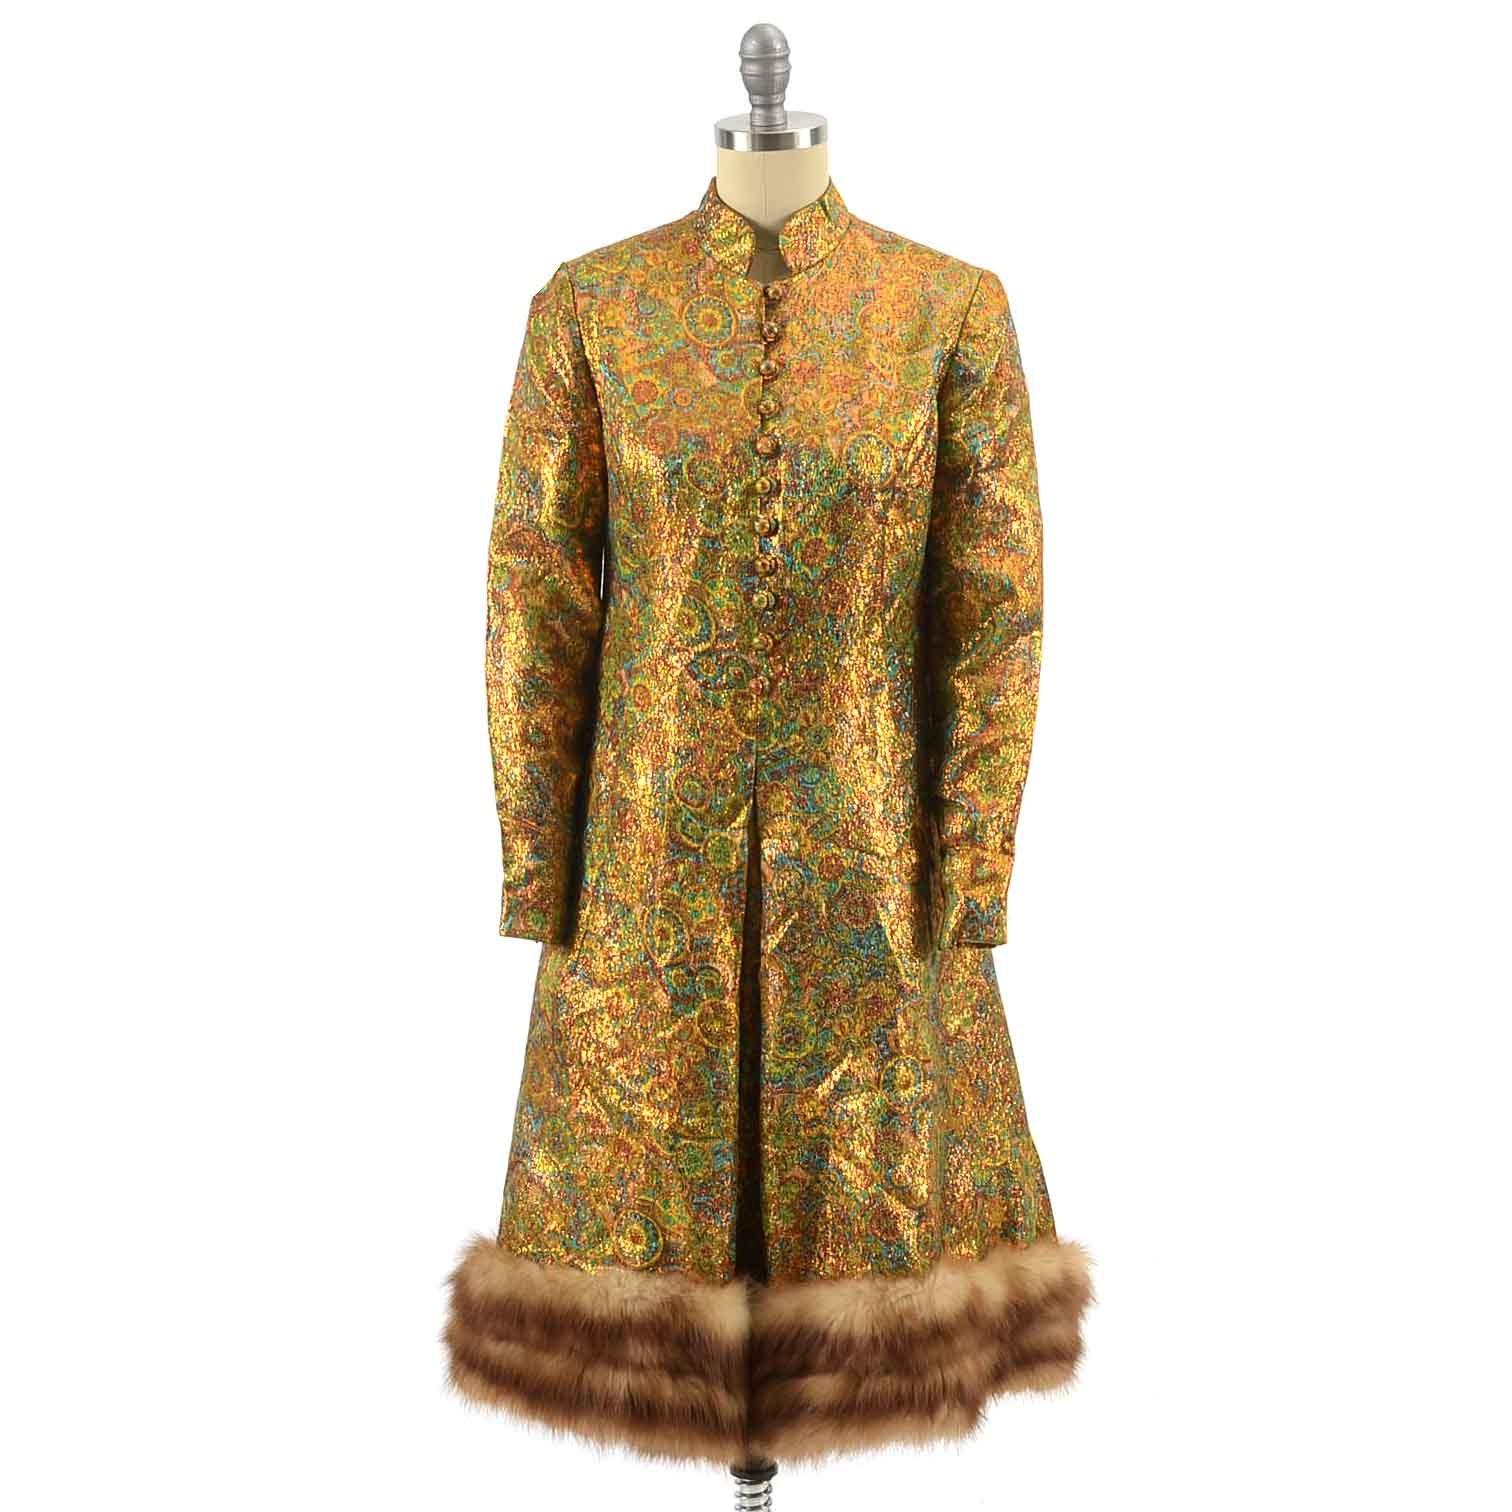 Vintage Chester Weinberg Dress with Faux Mink Fur Hem